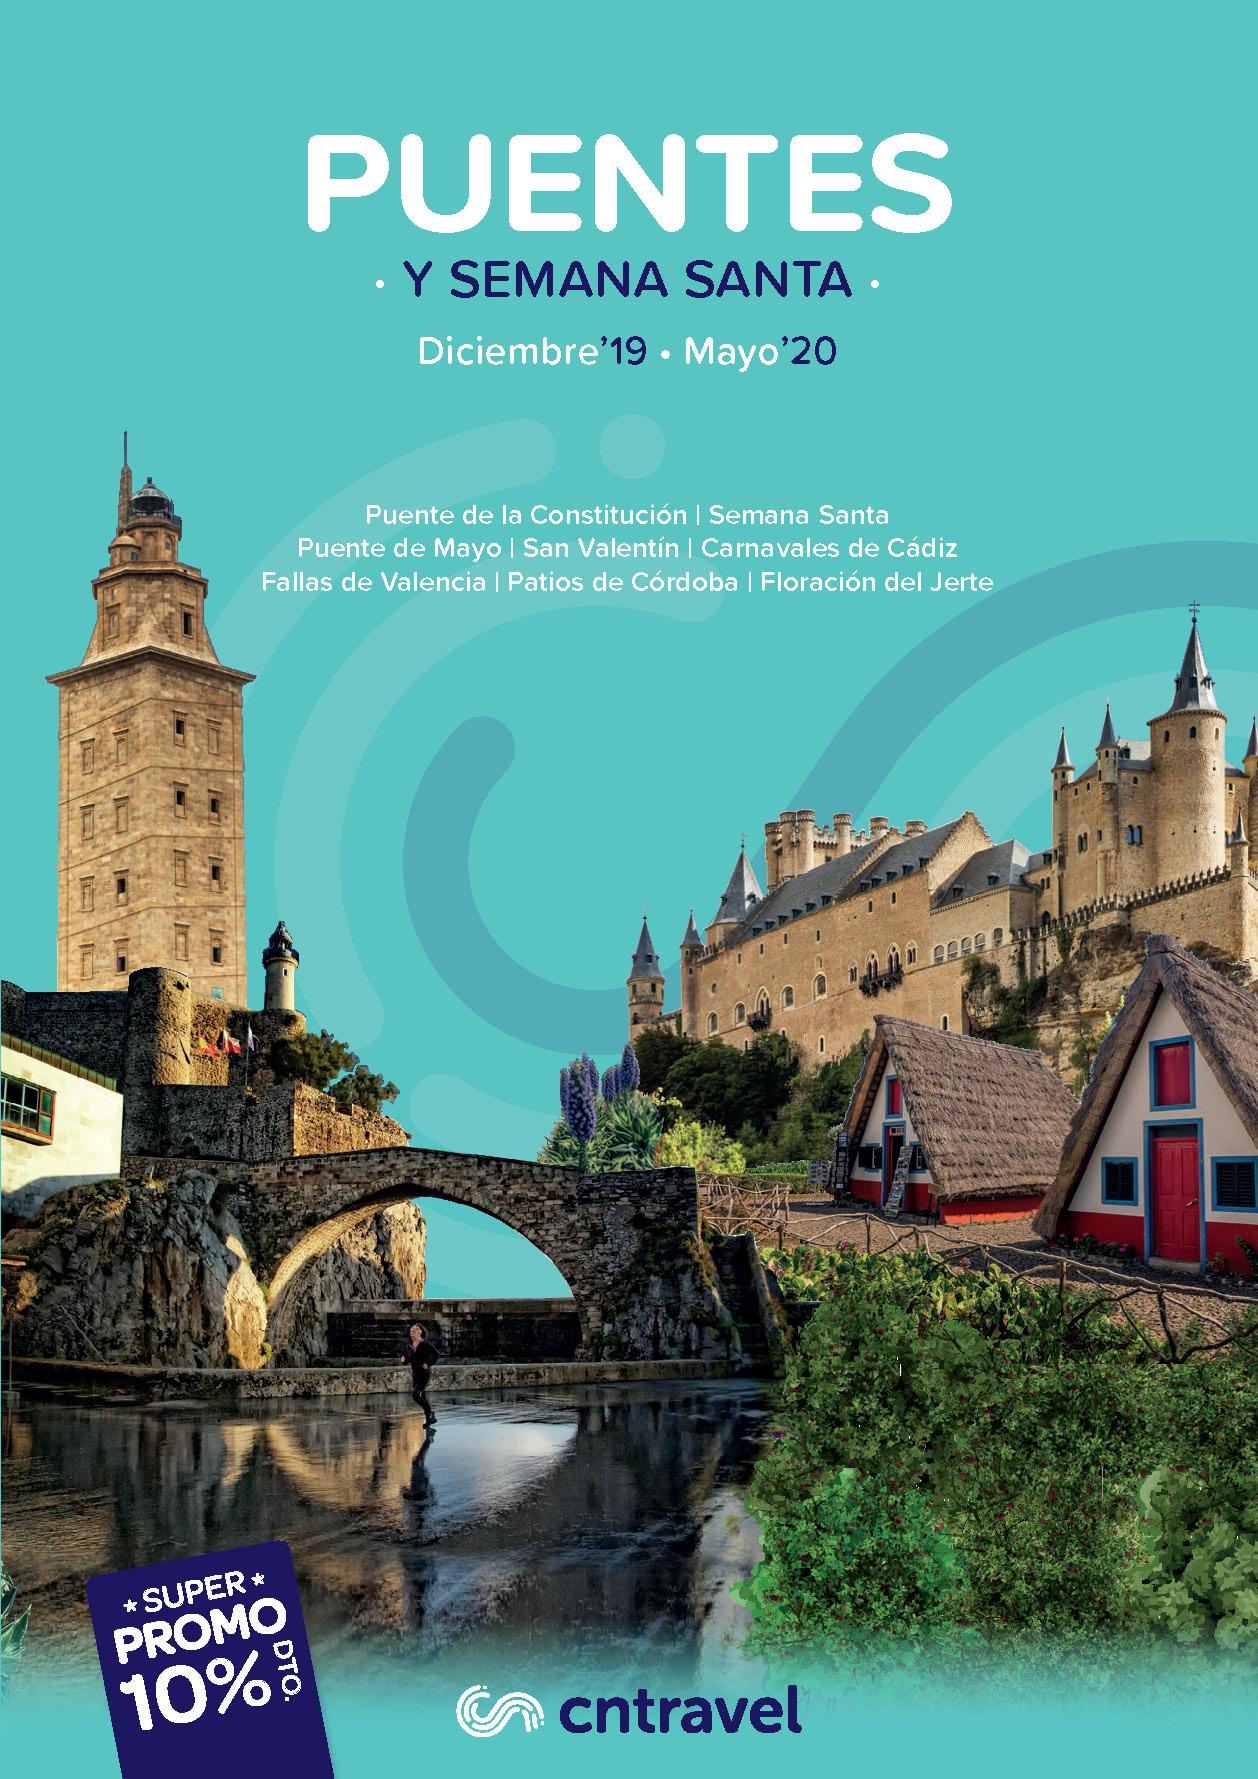 Catalogo CN Travel Puentes 2019-2020 salidas Centro